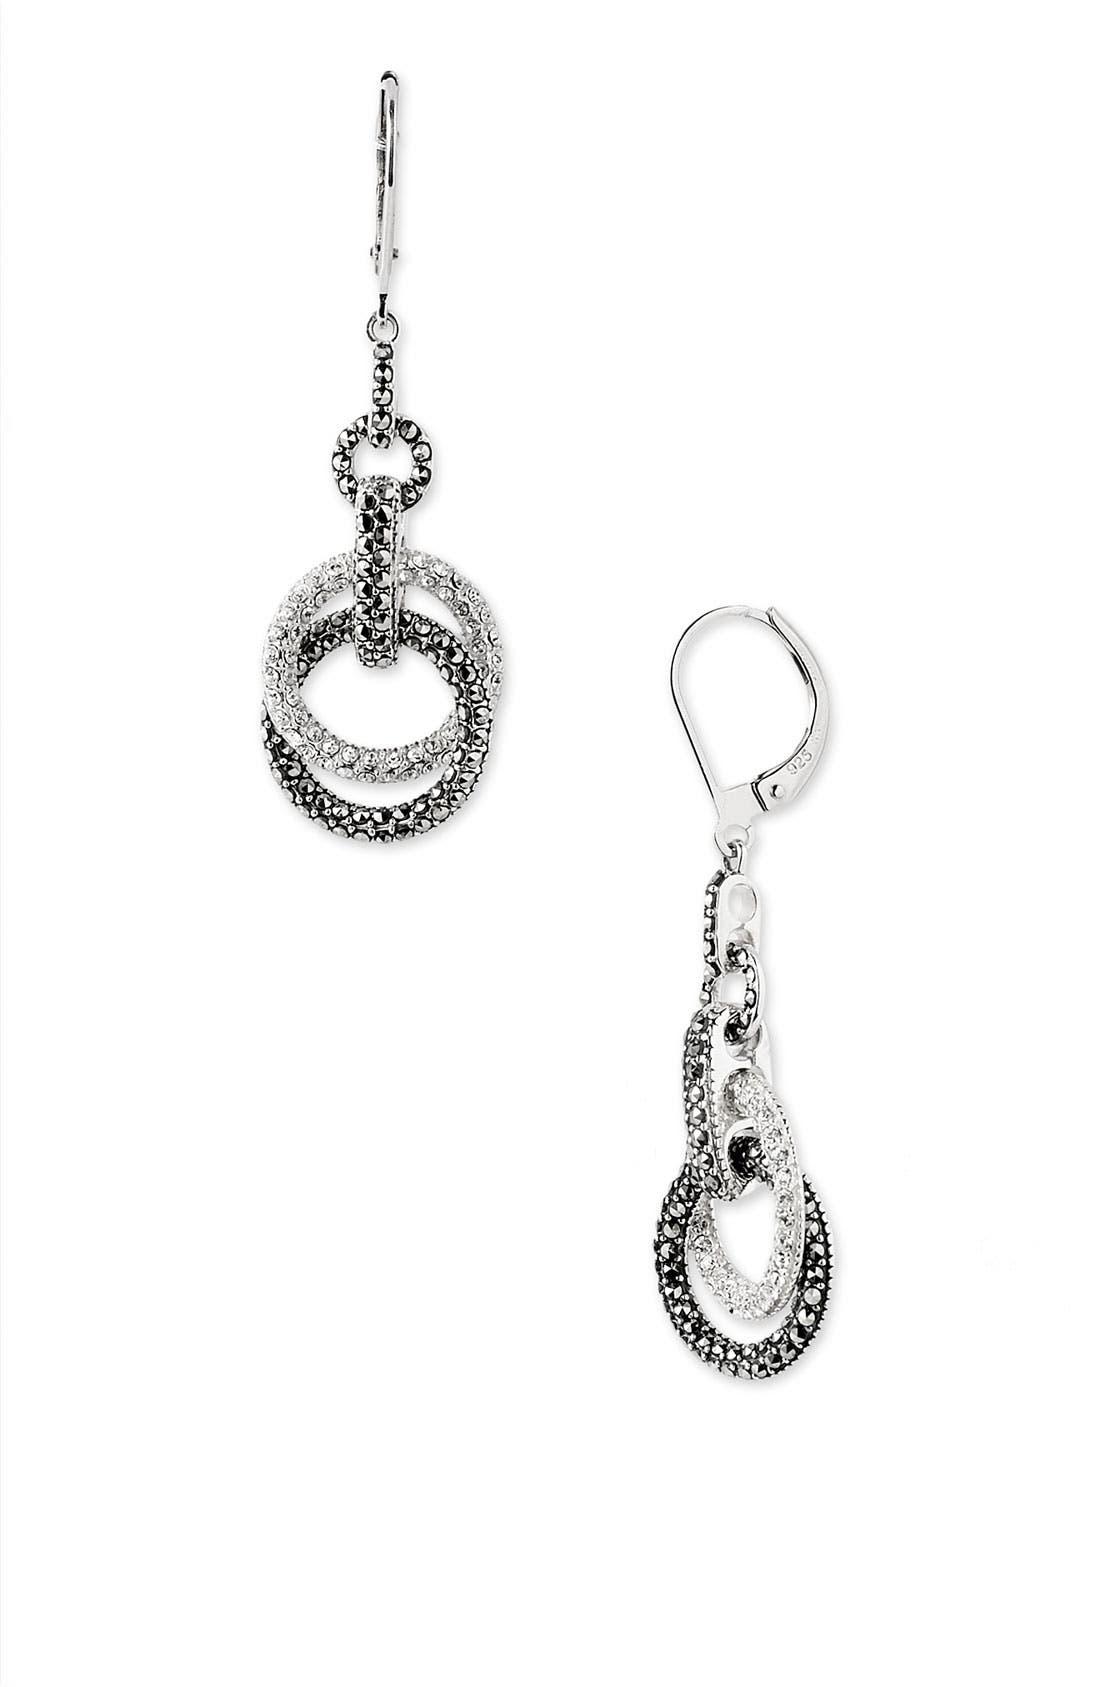 Main Image - Judith Jack Double Circle Drop Earrings